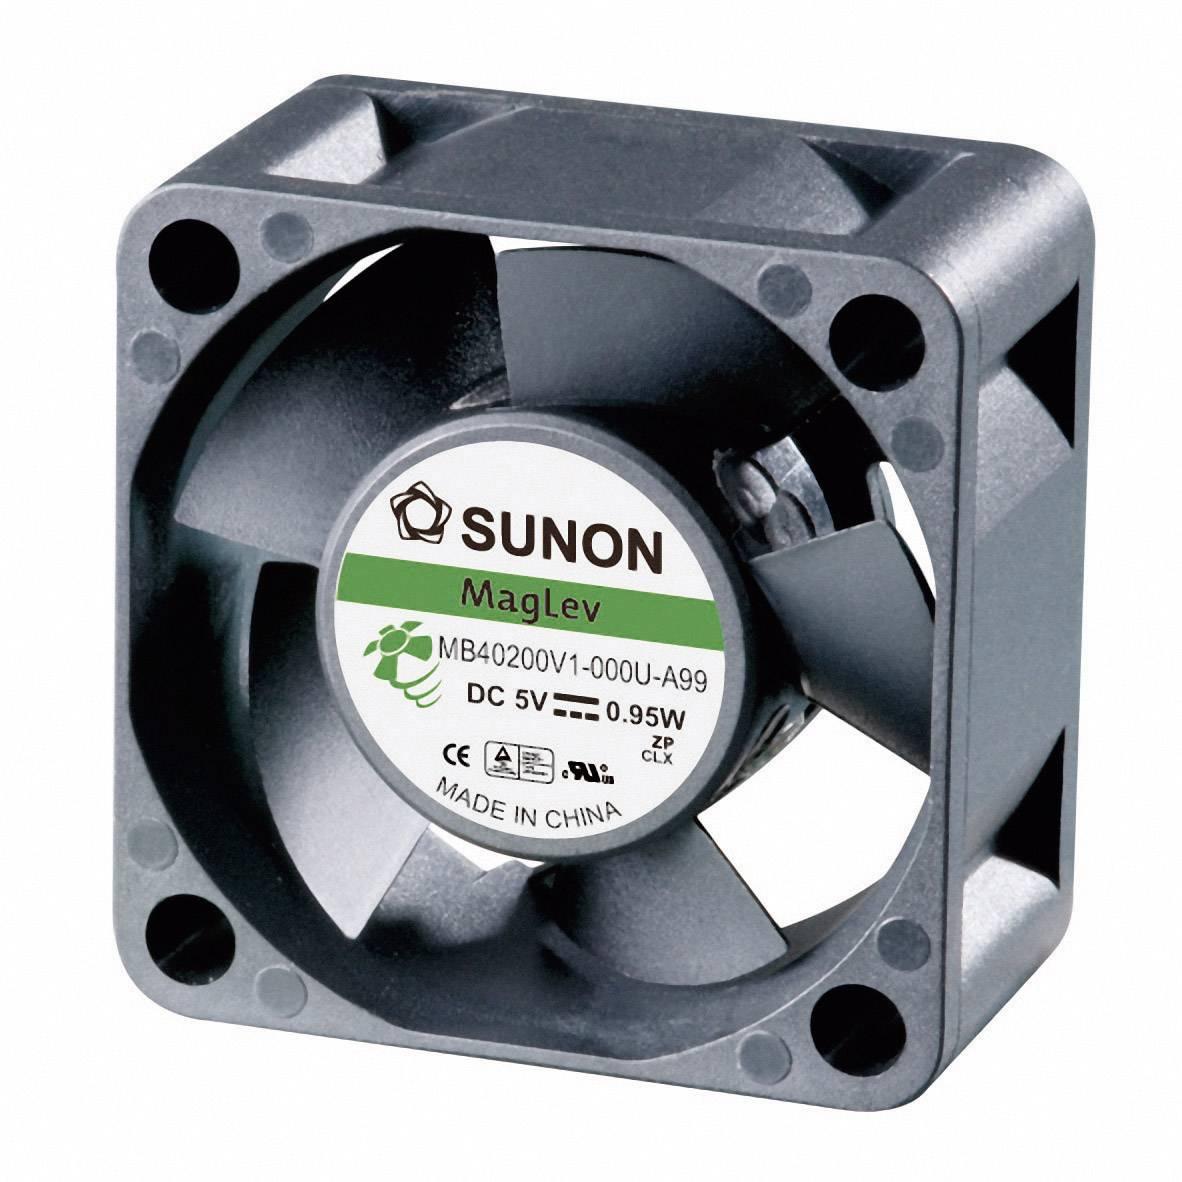 Axiálny ventilátor Sunon MB40201V3-0000-A99 MB40201V3-0000-A99, 12 V/DC, 18 dB, (d x š x v) 40 x 40 x 20 mm